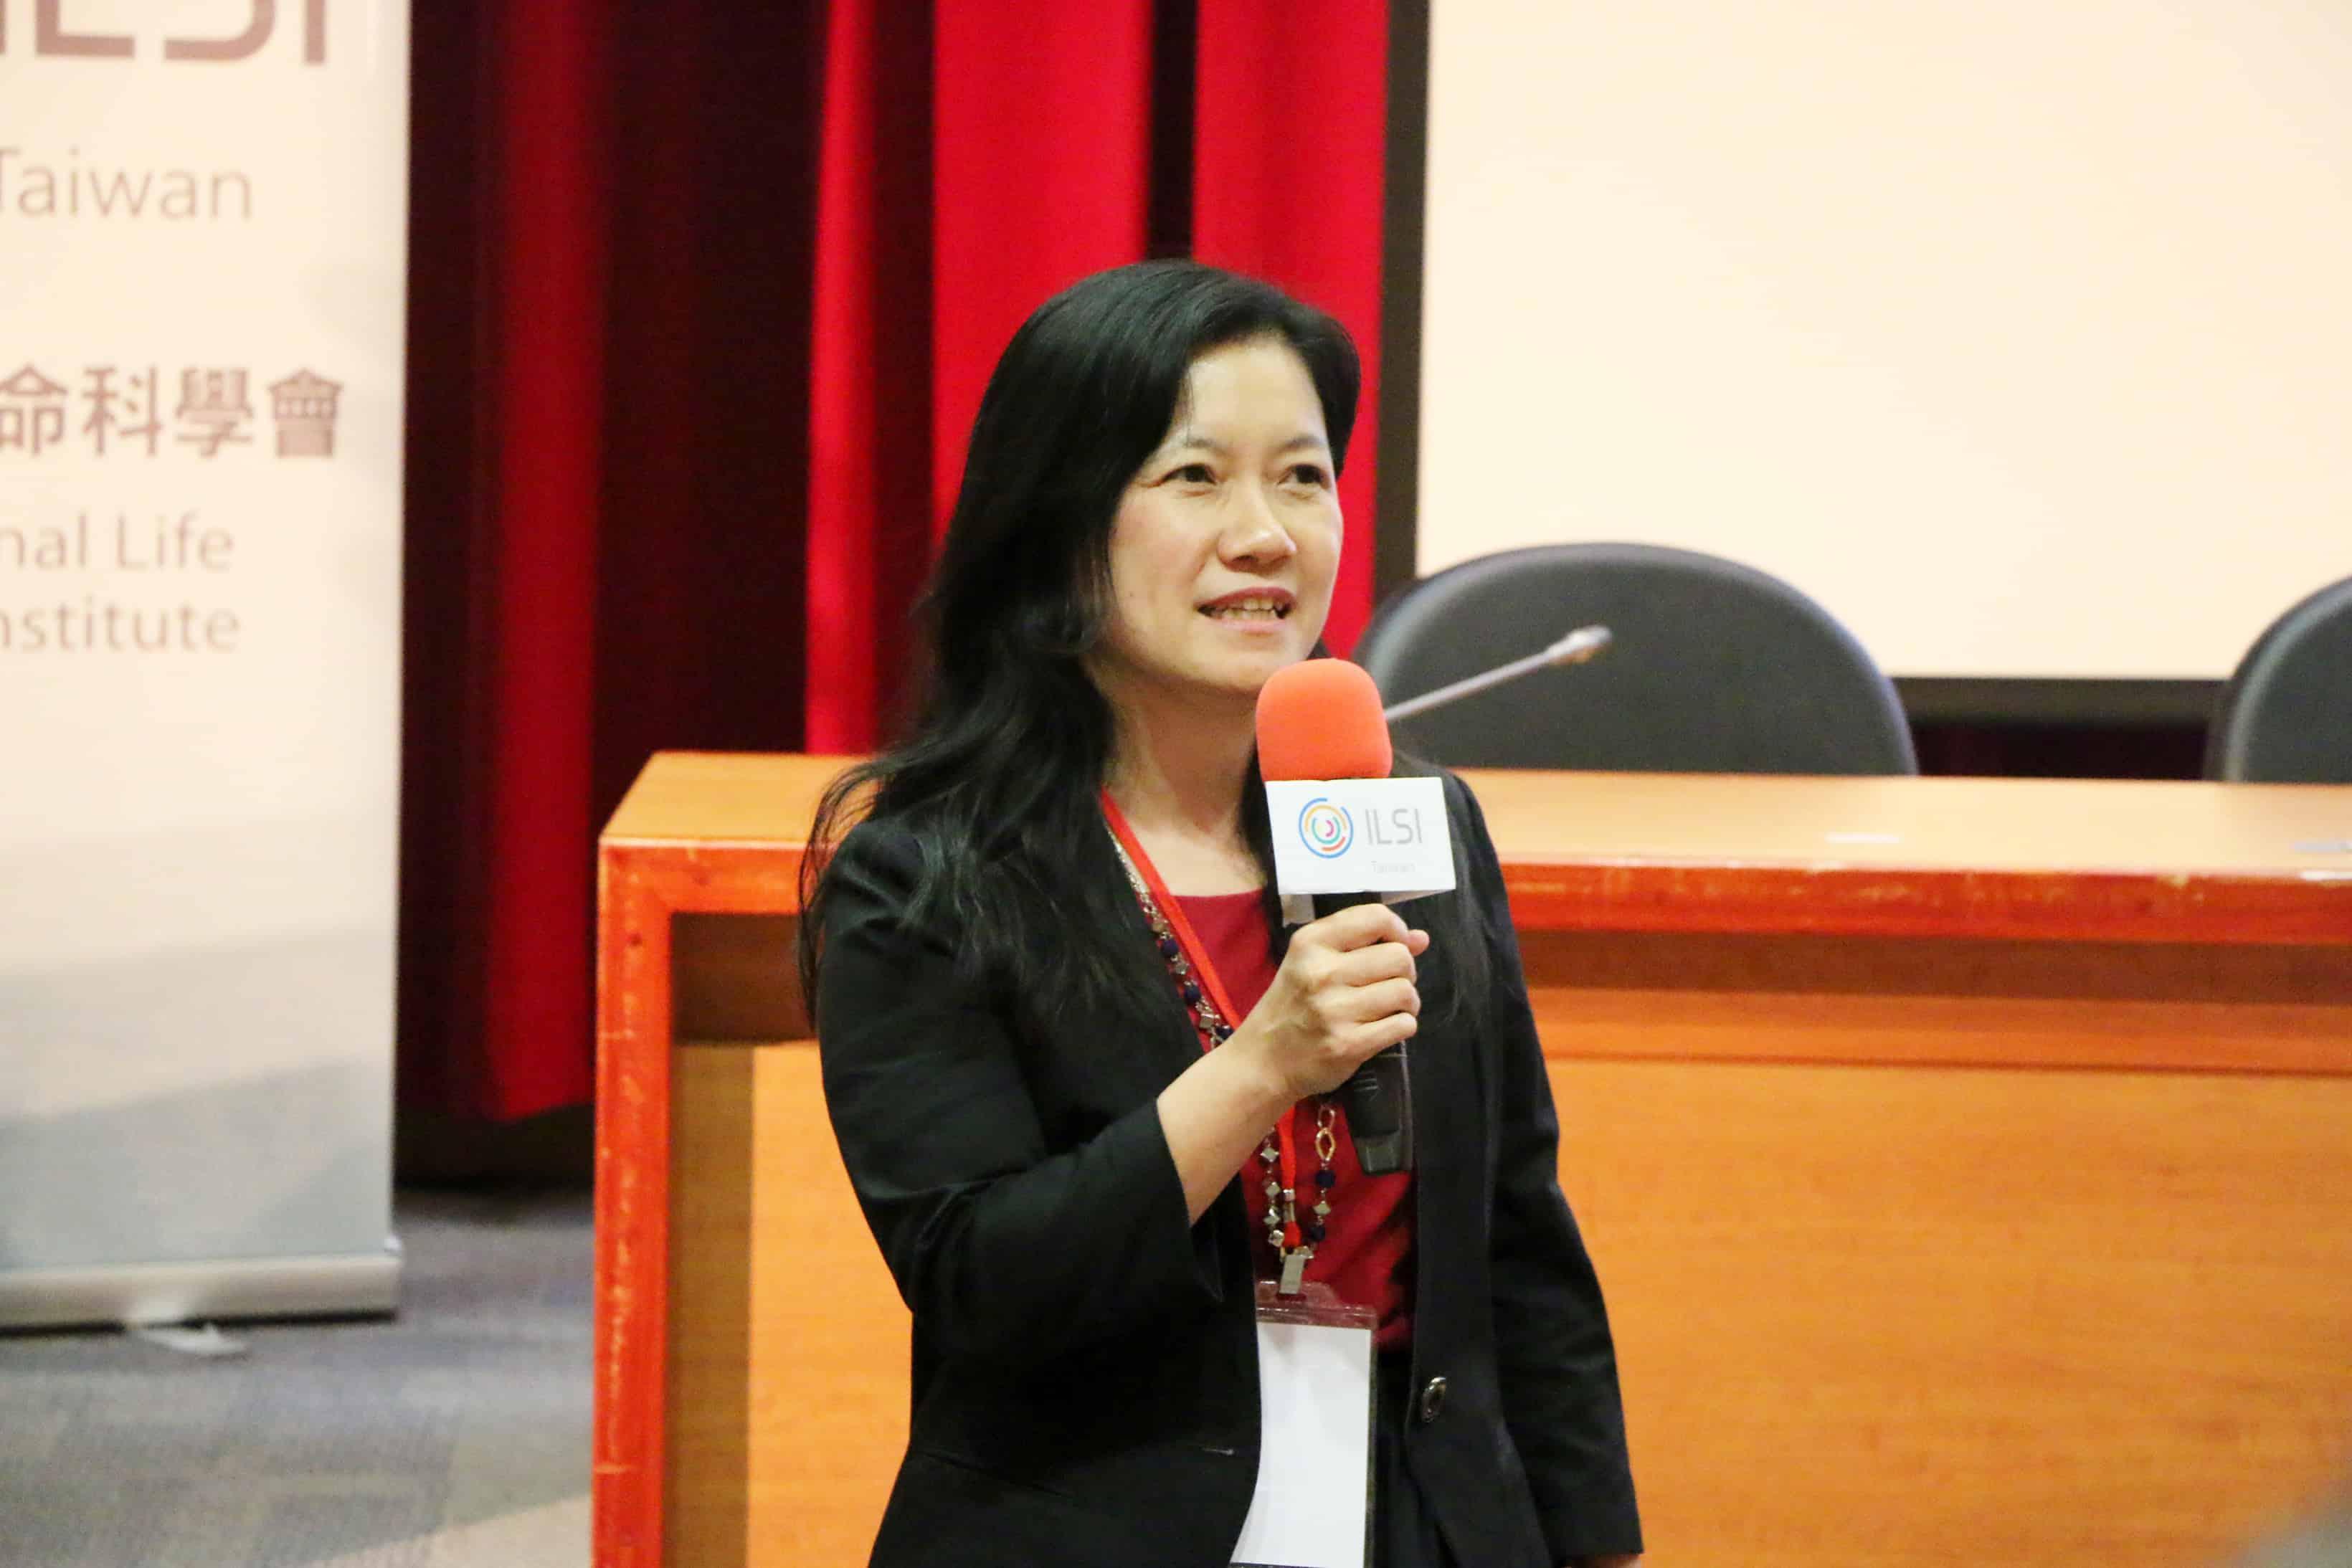 Bonnie Chou